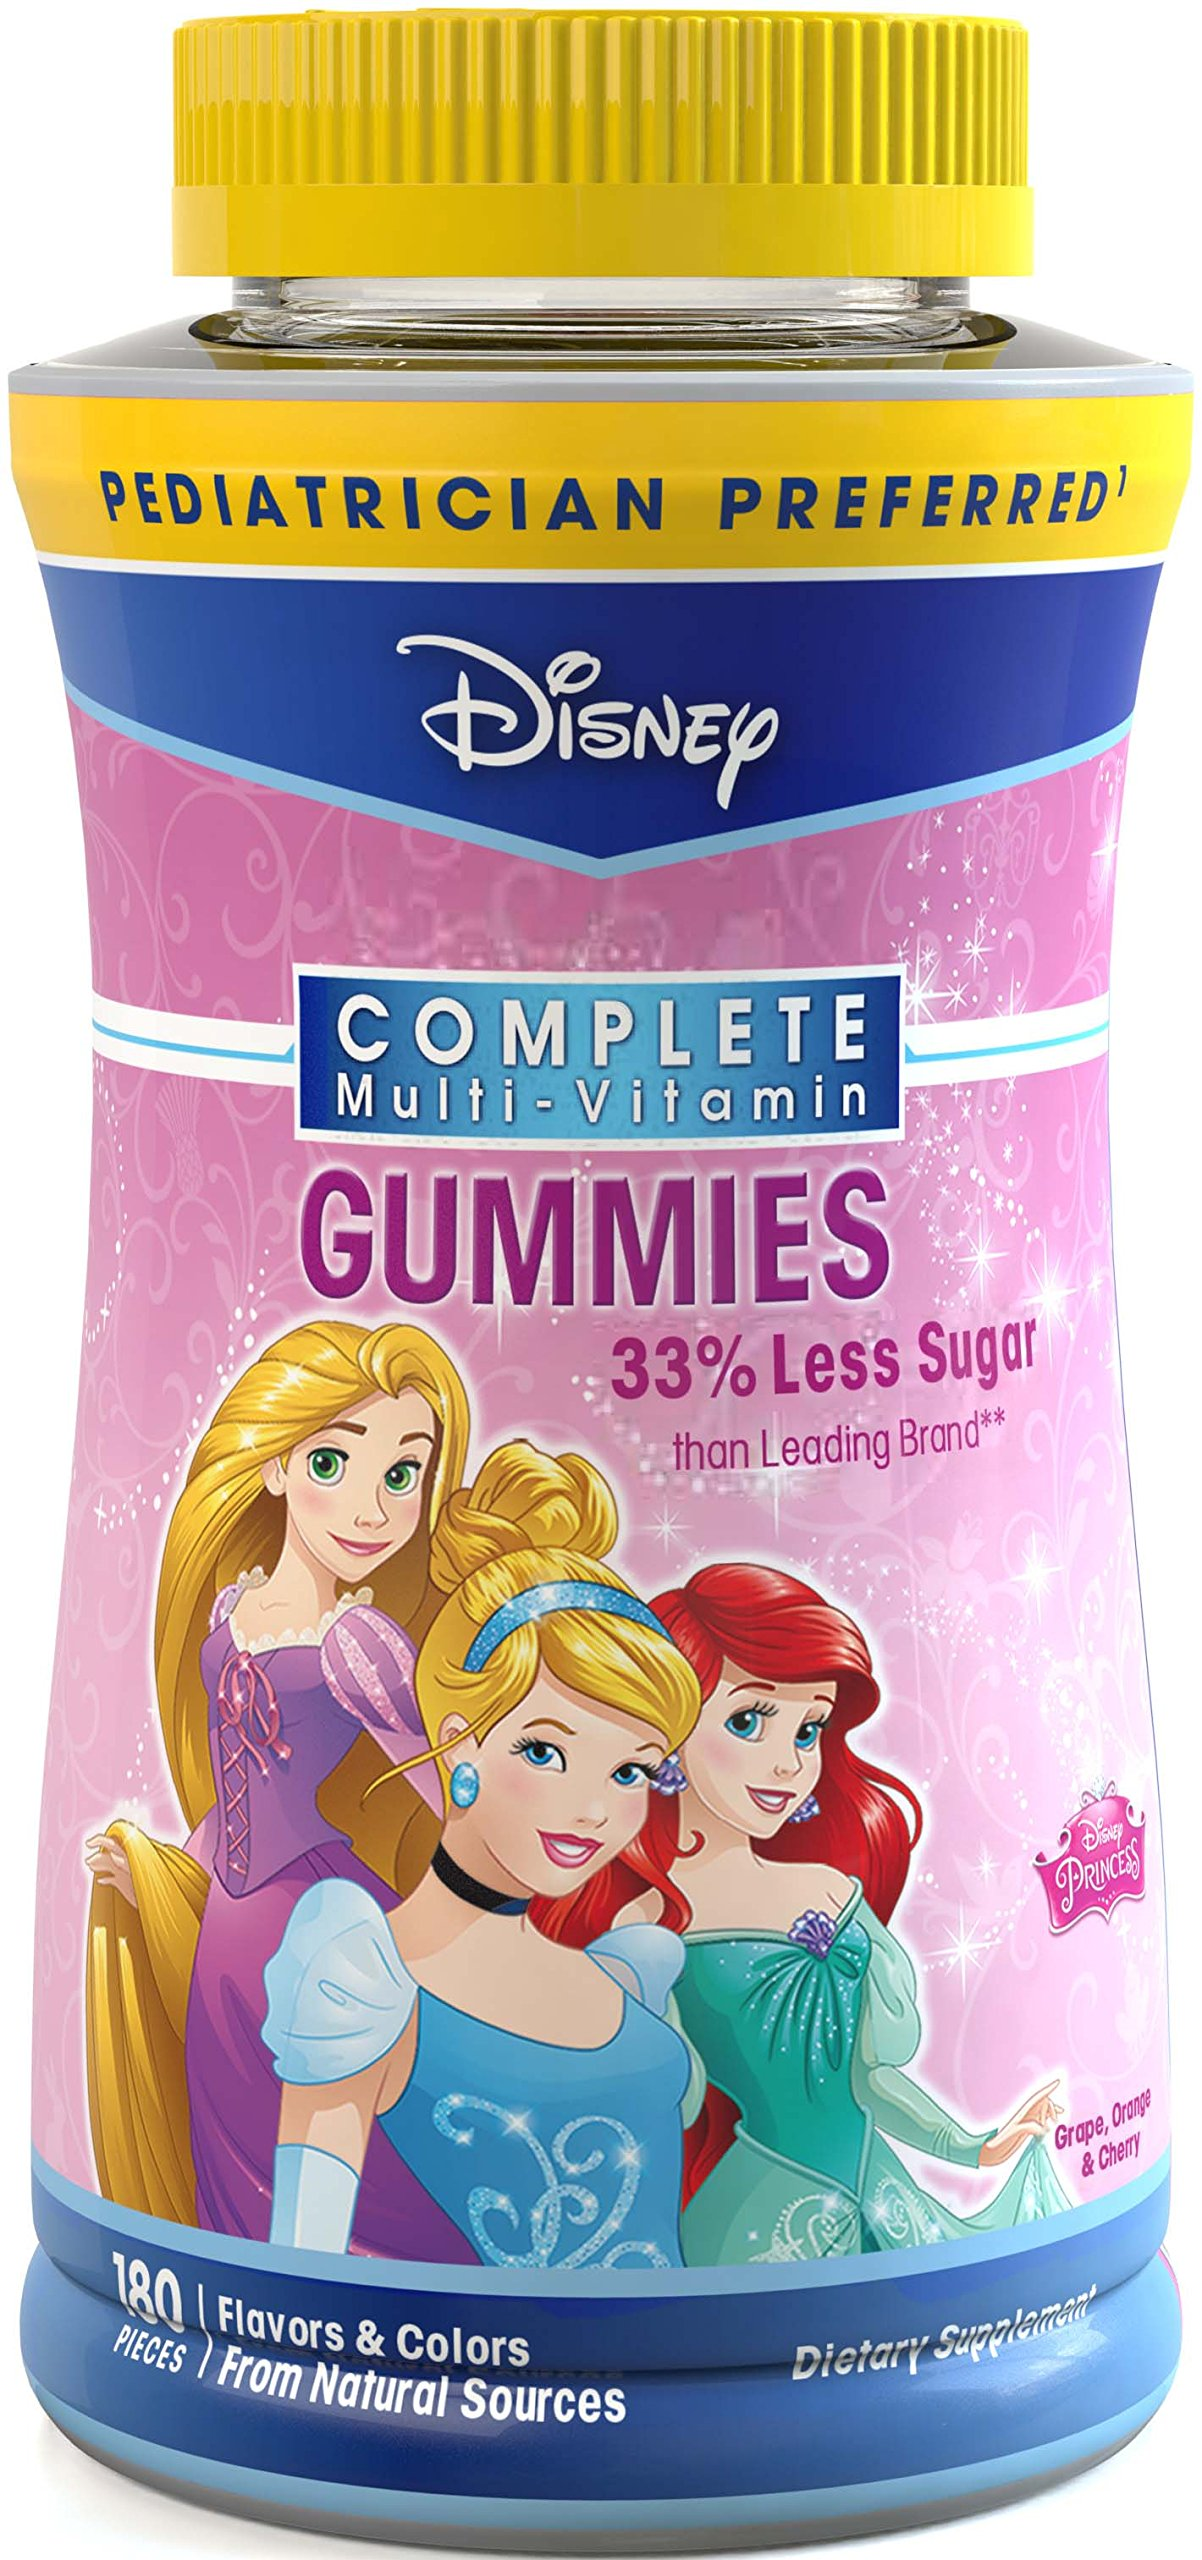 Disney Princess Complete Multi-Vitamin Gummies, 180 Count